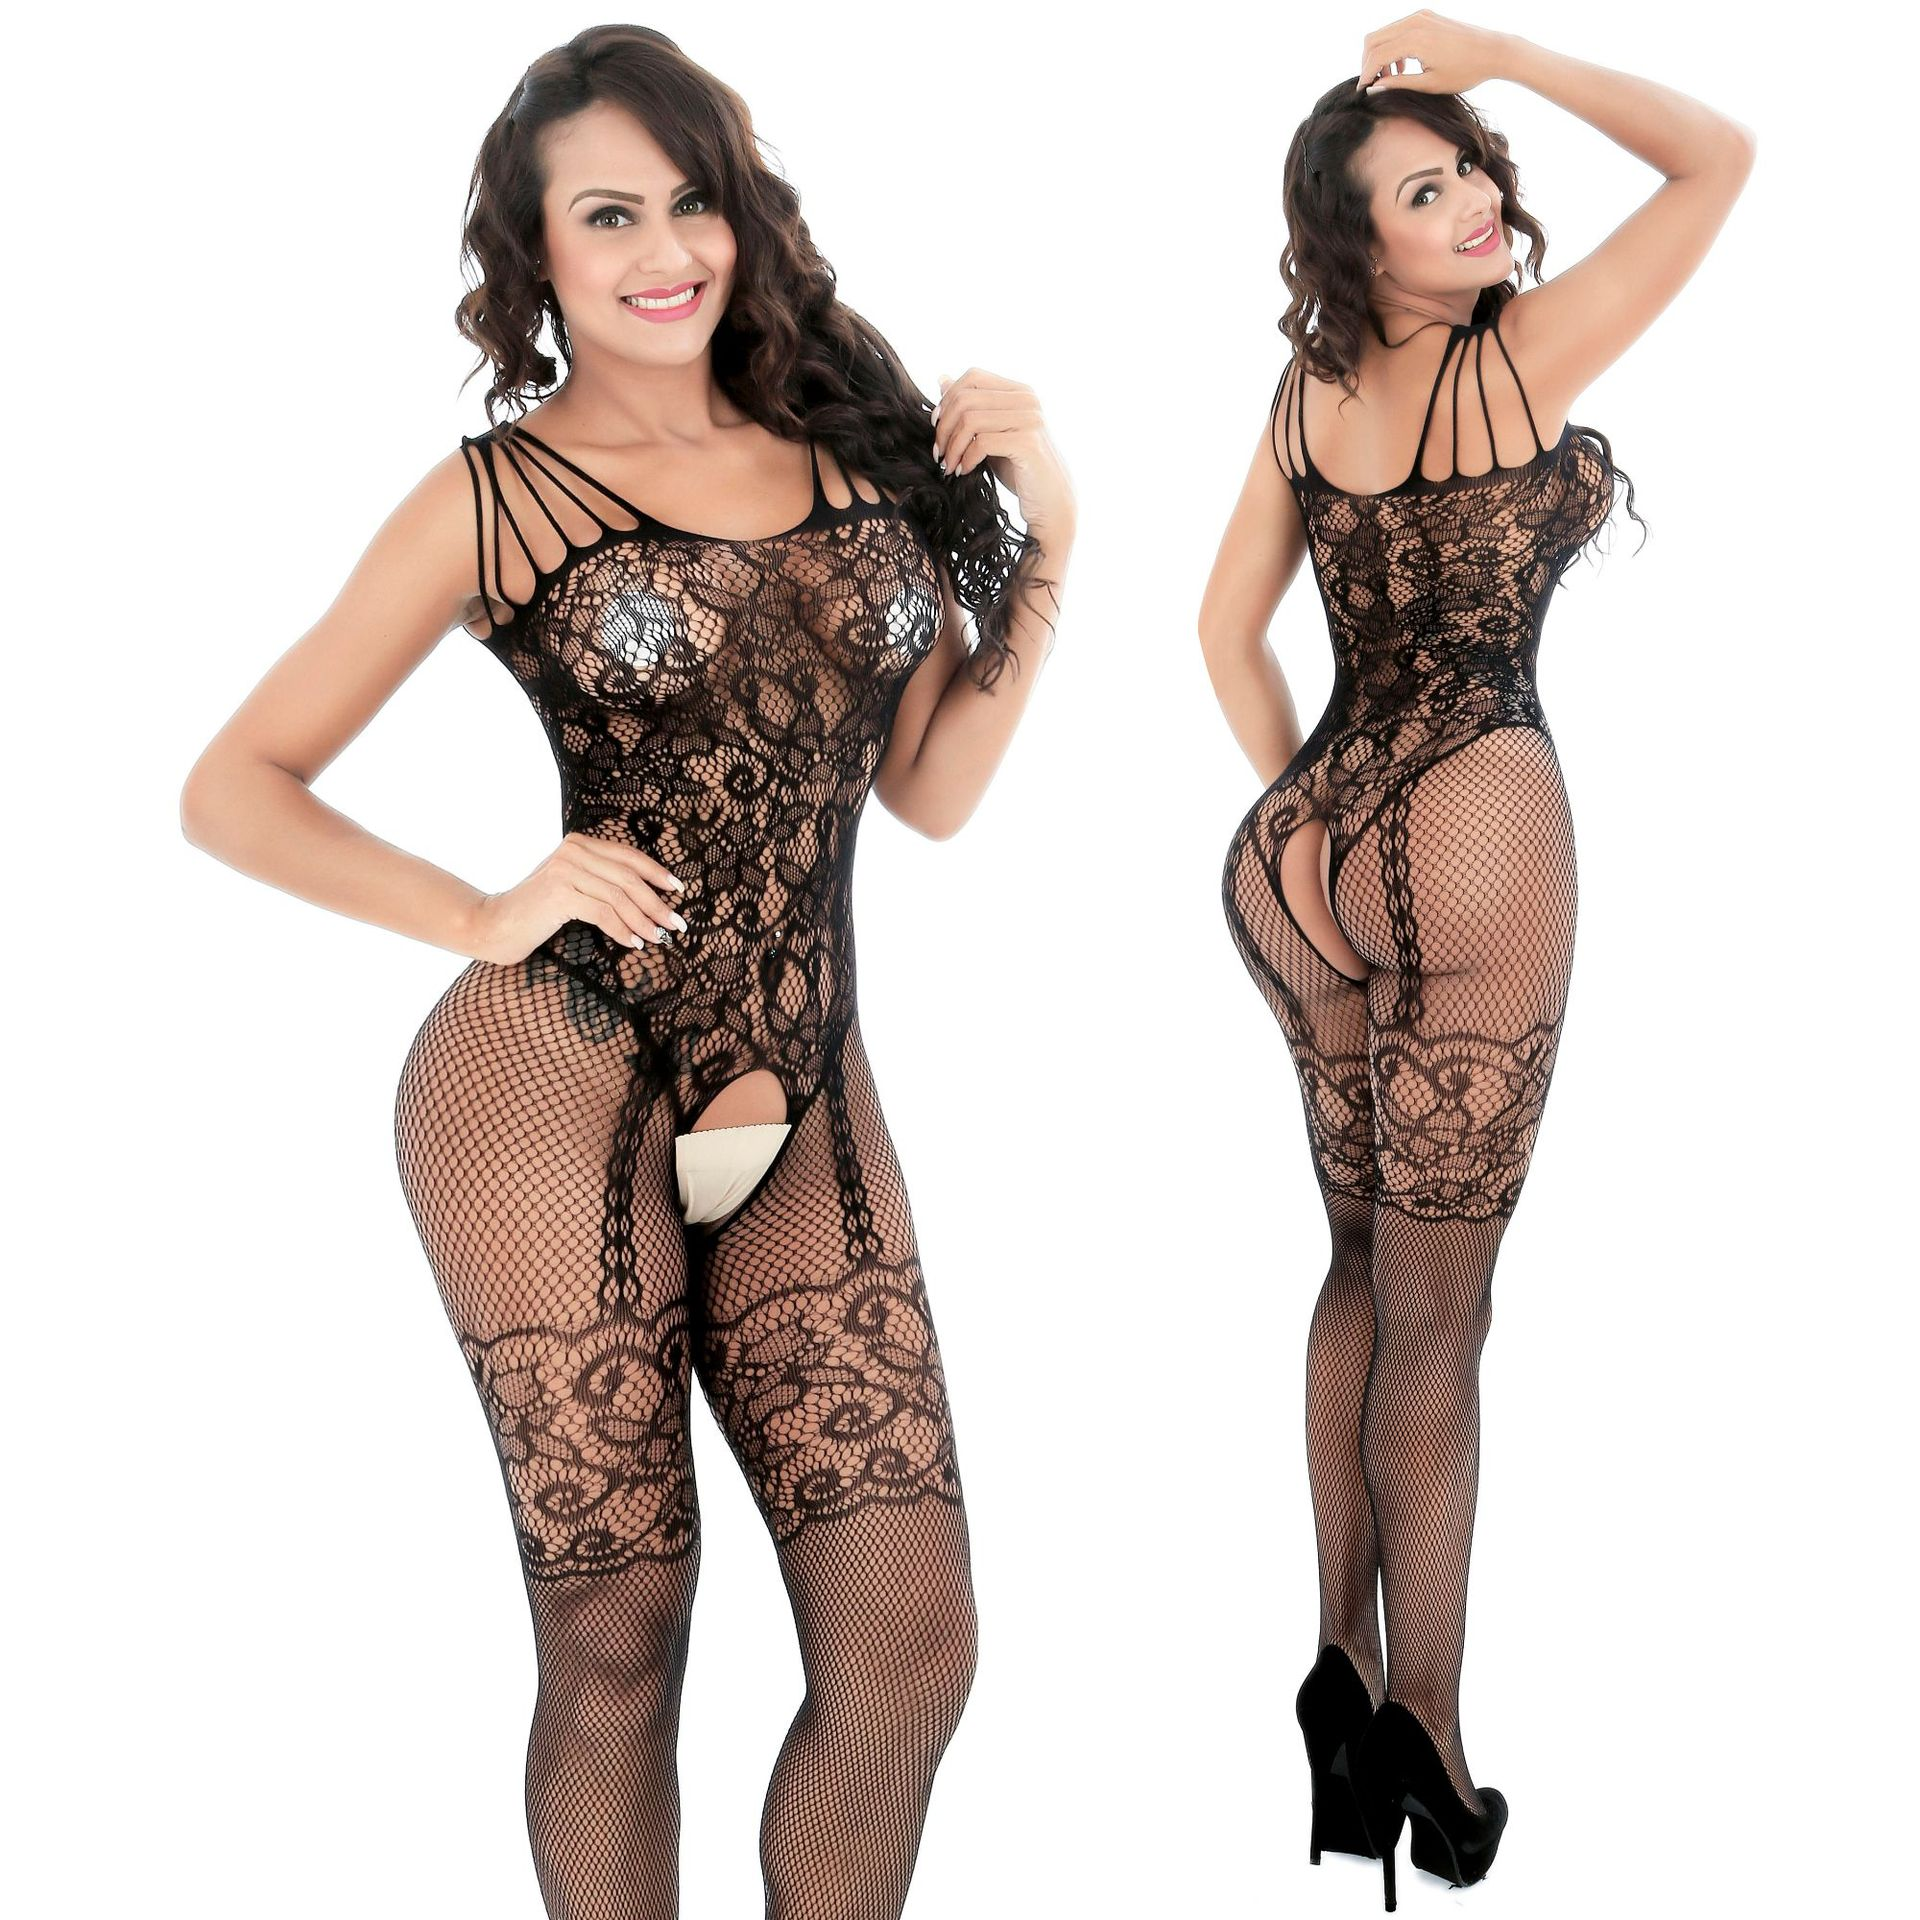 Muñeca Hinchable Porno Estar Gia Darling top 9 most popular bodys sexys ideas and get free shipping